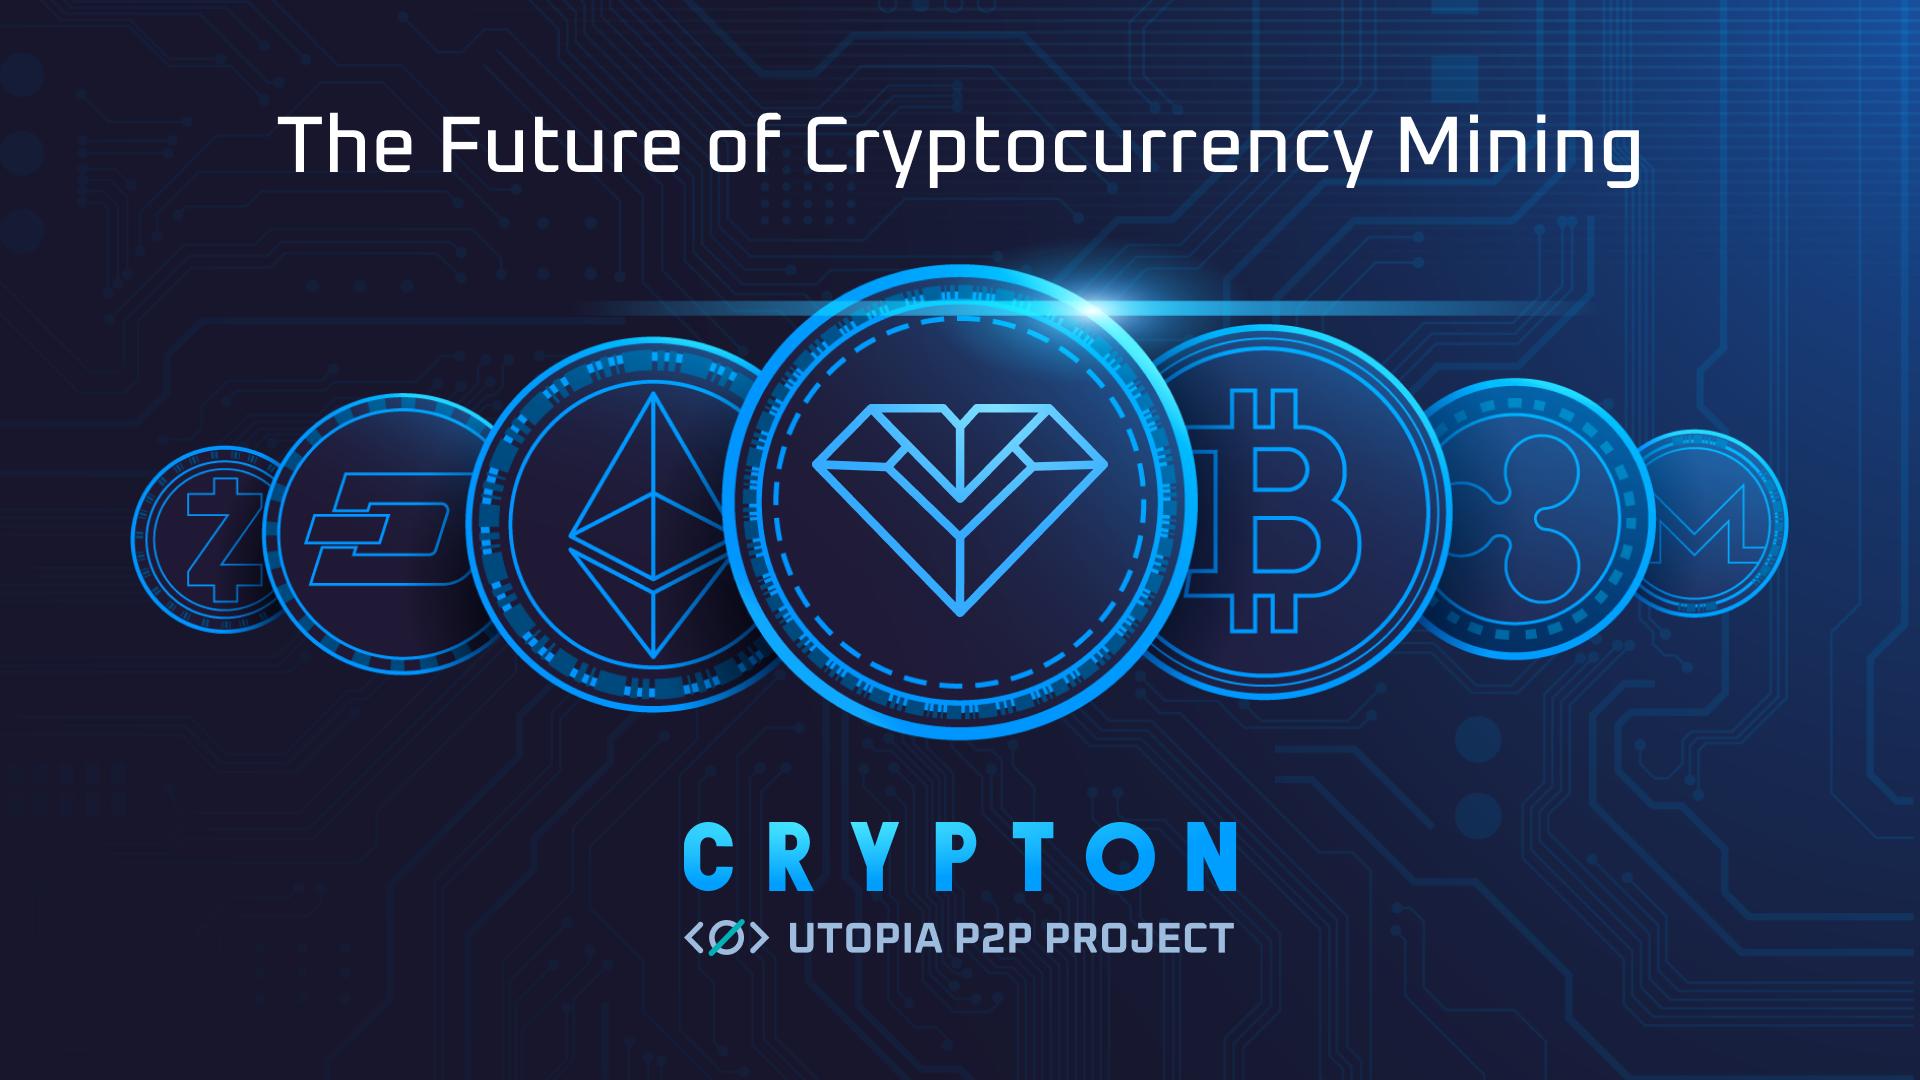 Future of Cryptocurrency Mining — Utopia's Crypton Ecosystem